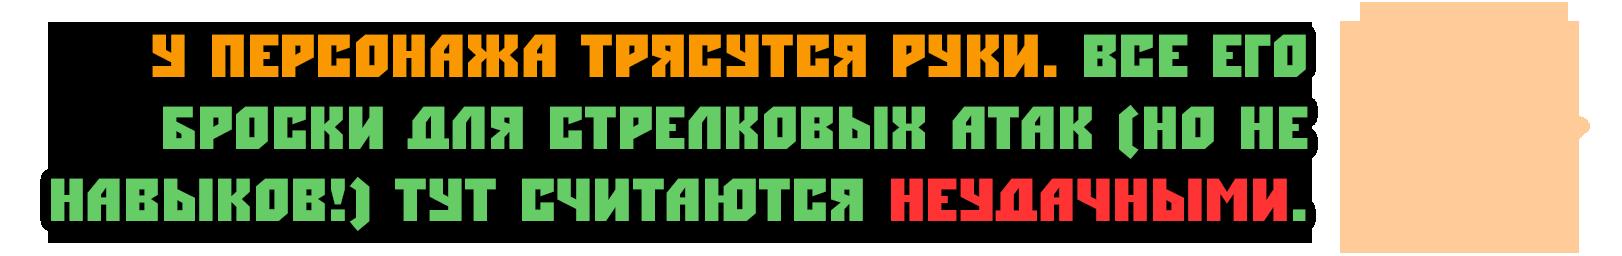 Тест разных элементов - Страница 5 O4ki_ustalosti_T_ruki_Forum_Vova_2